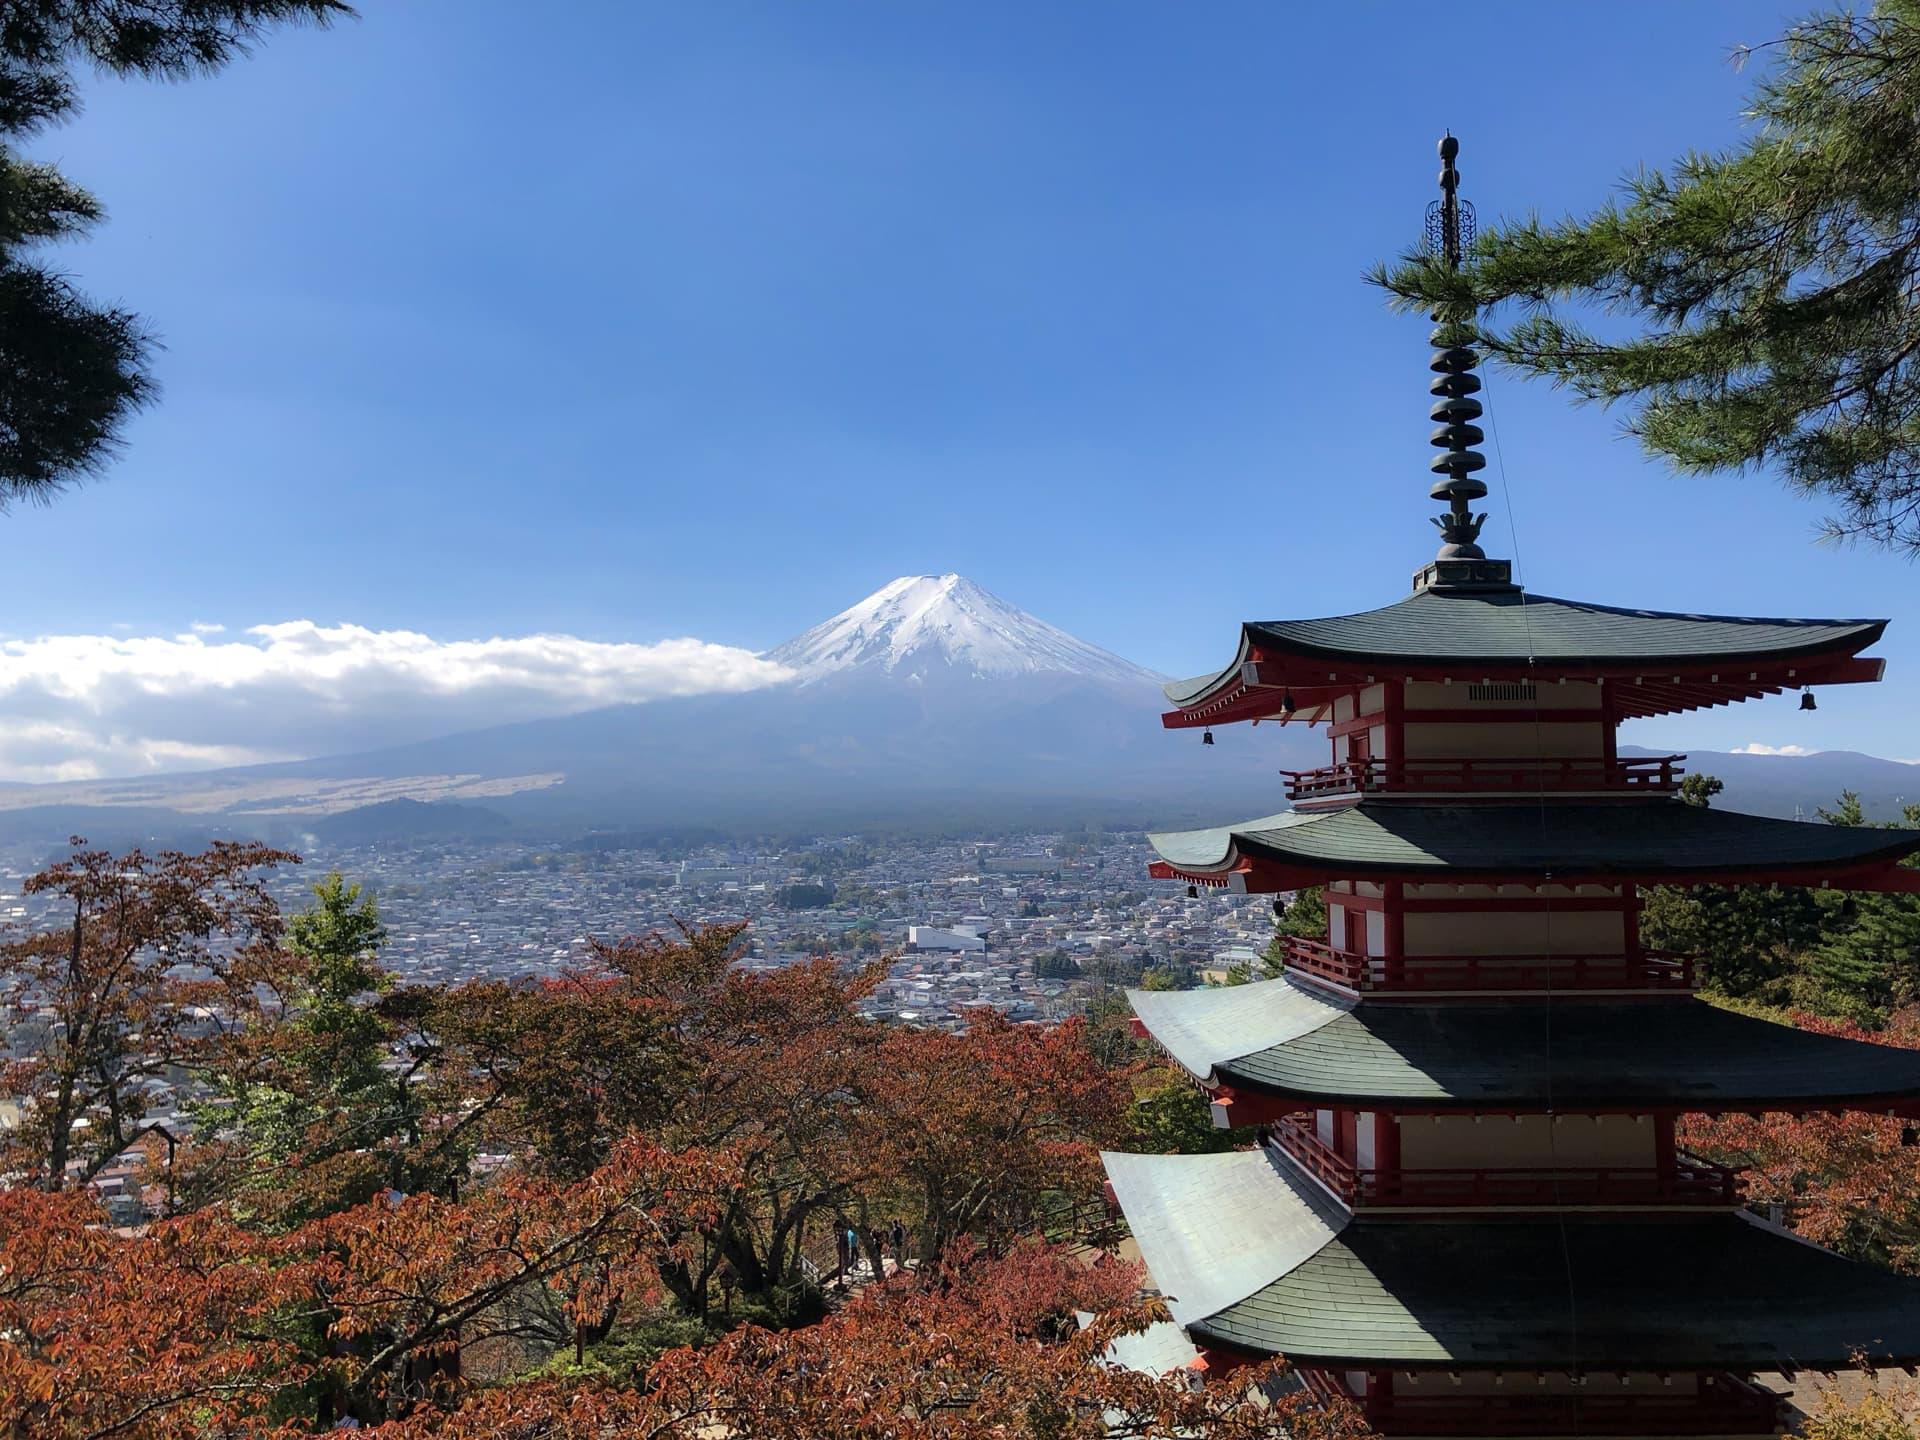 Chureito Pagoda Mt. Fuji Japan